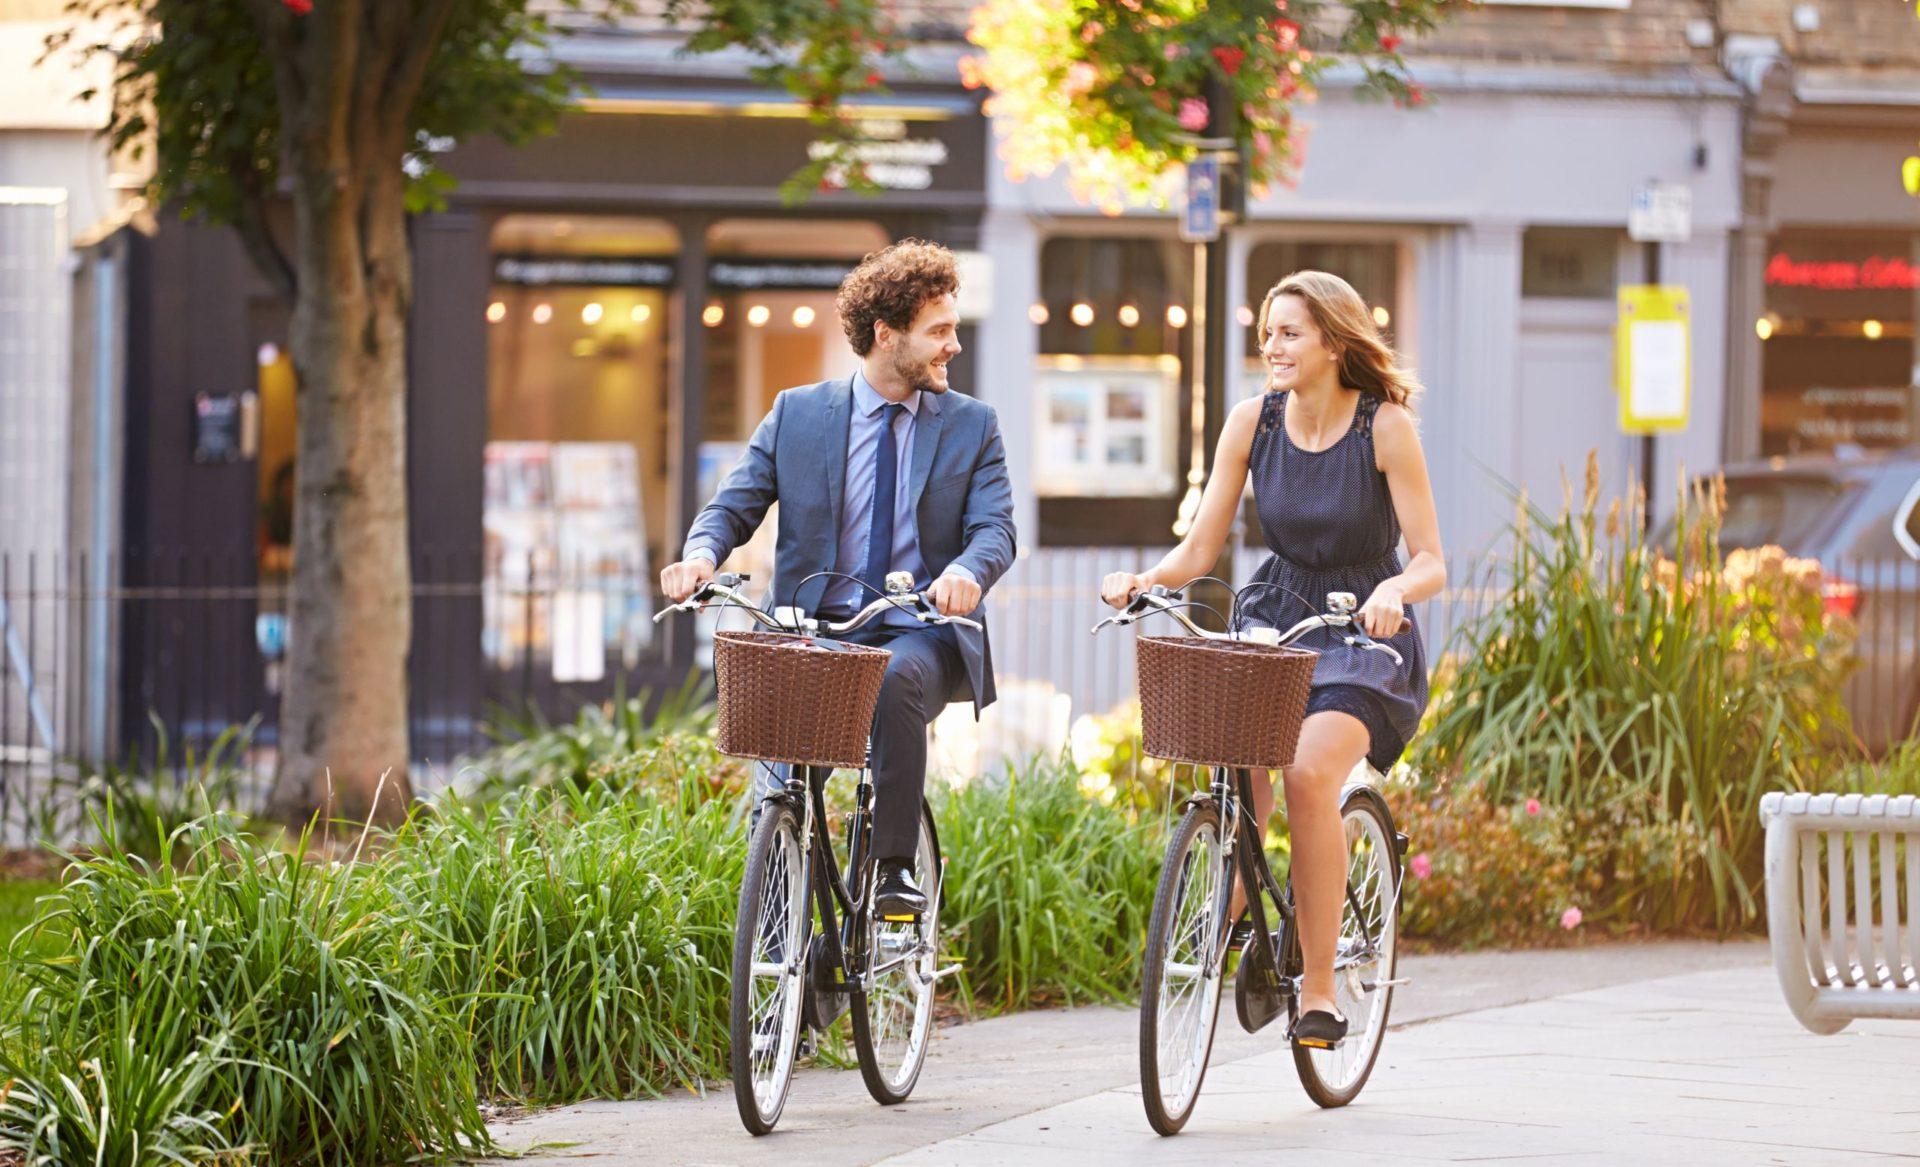 parkovanie bicyklov